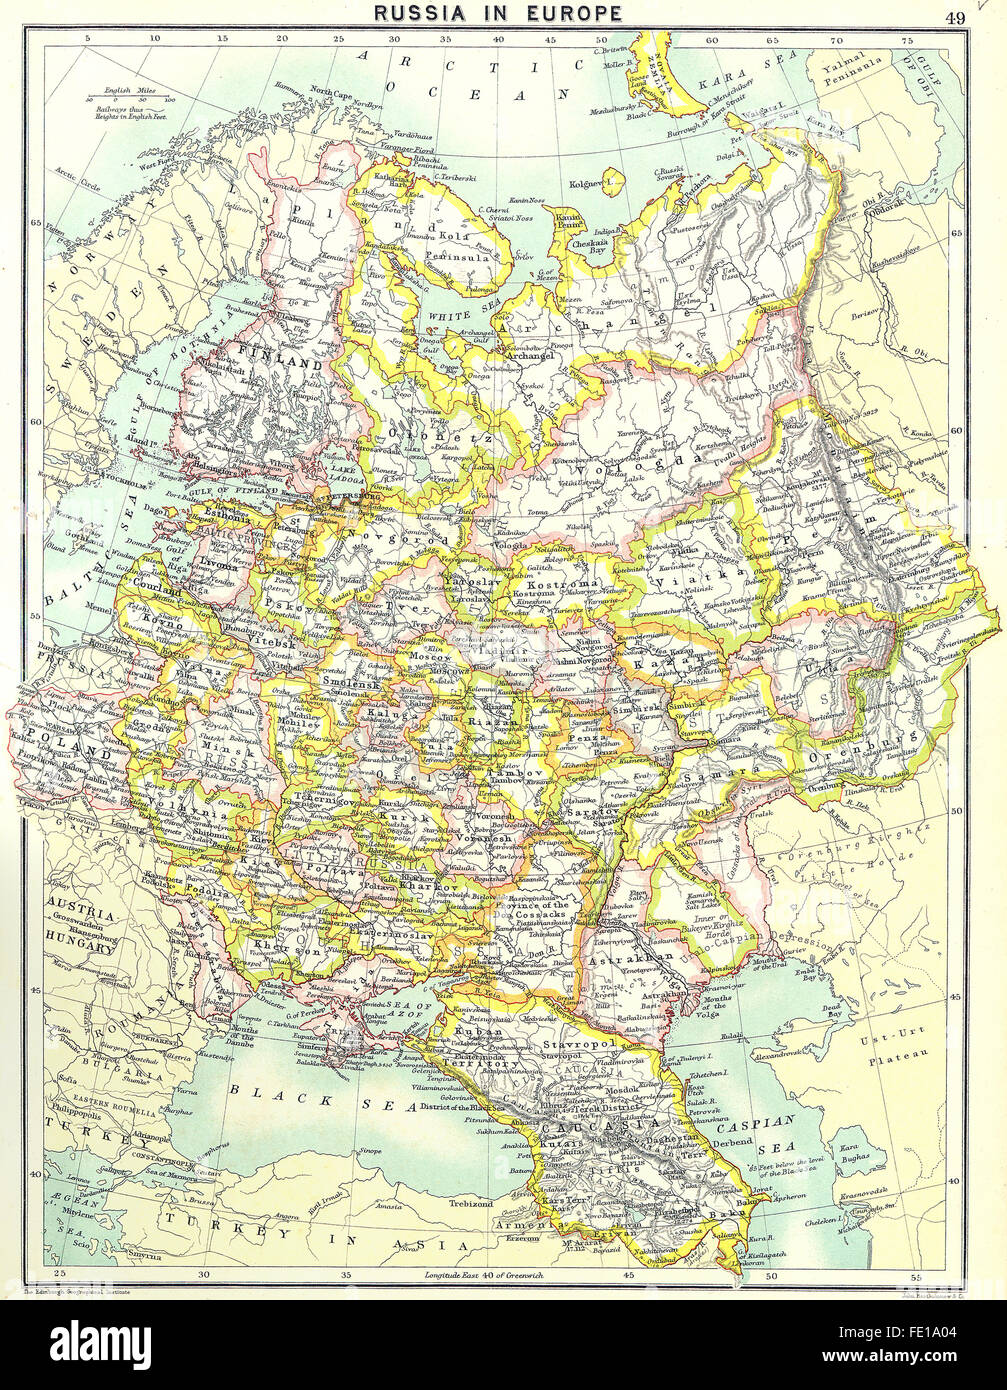 Russia European Russia 1900 Antique Map Stock Photo 94686820 Alamy